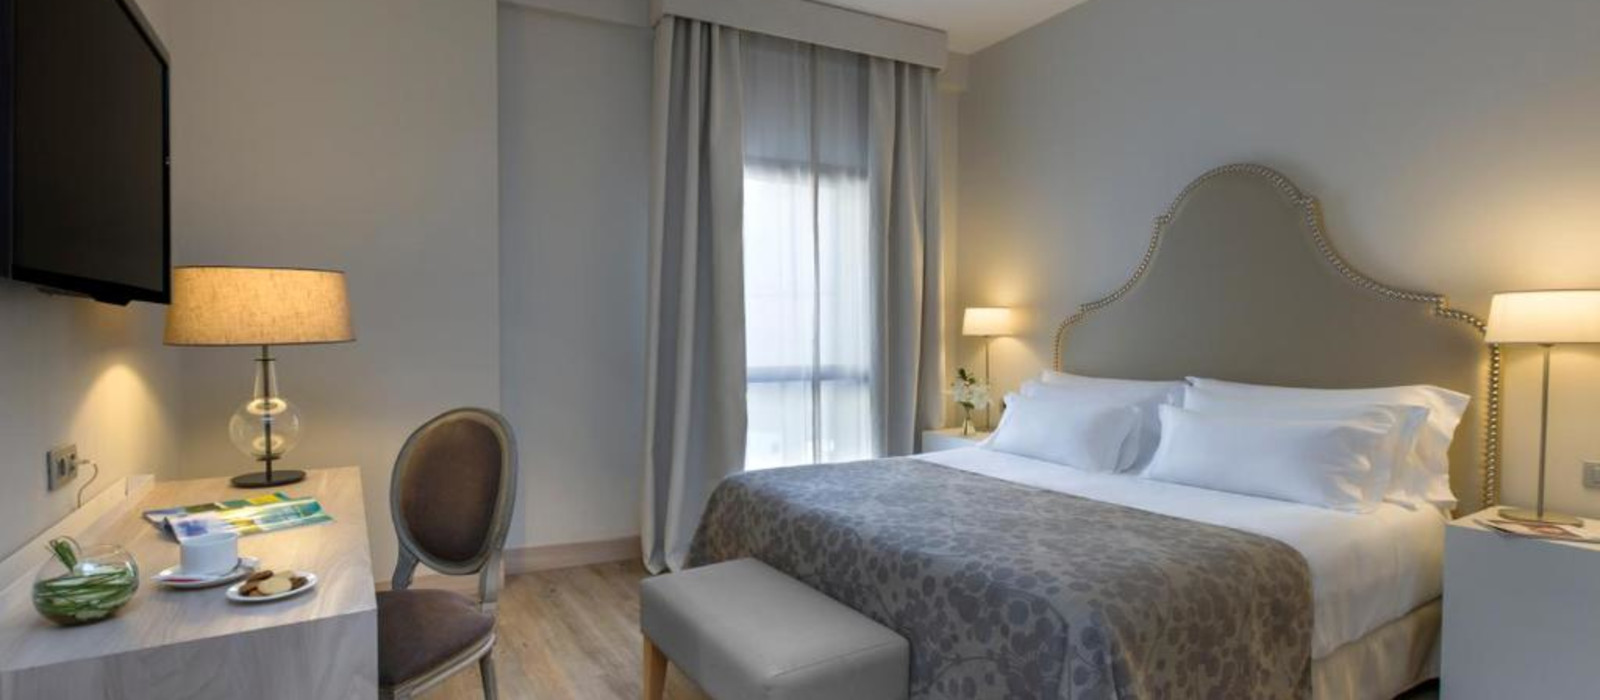 Hotel NH Collection Amistad Córdoba Spanien